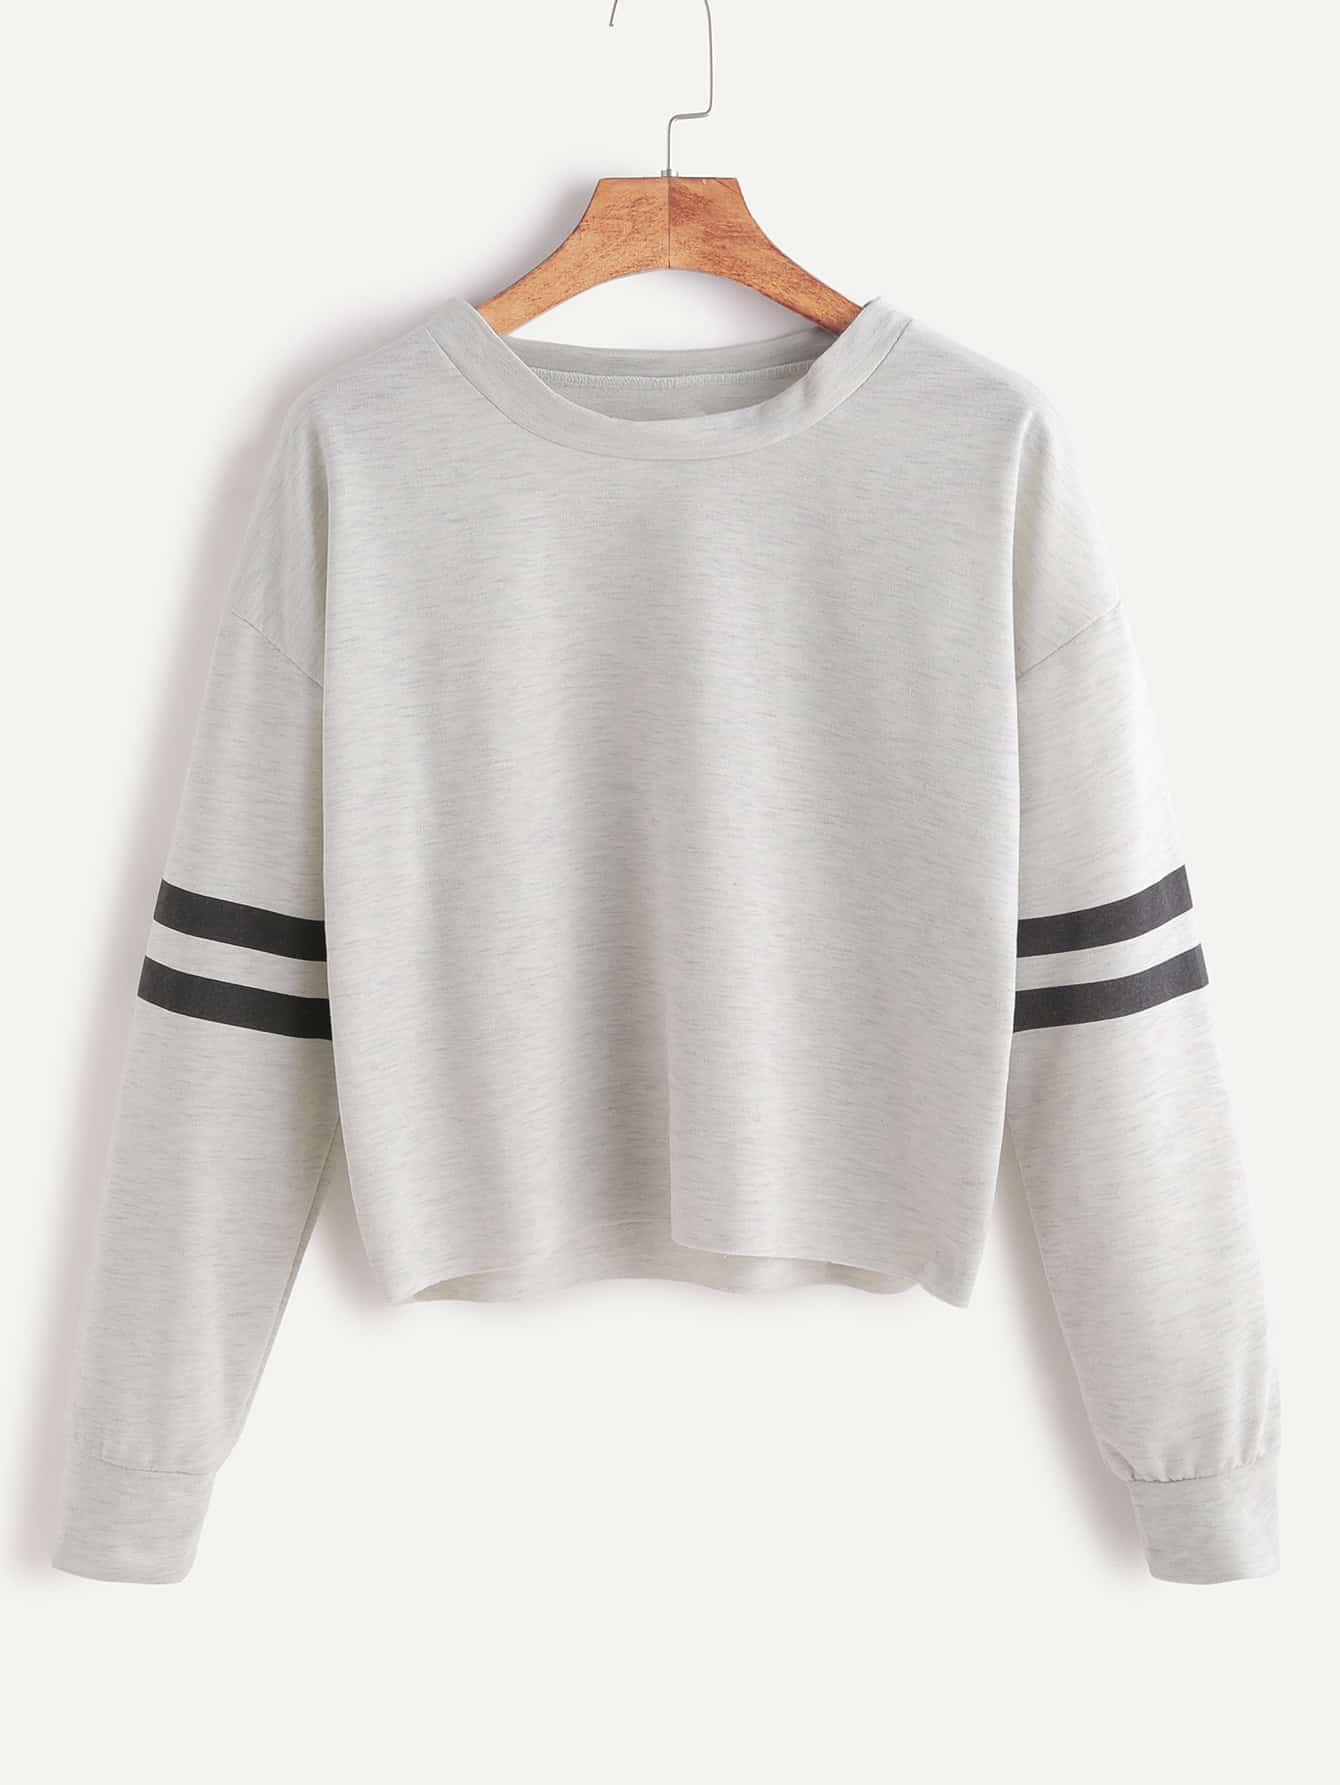 Heather Grey Drop Shoulder Varsity Striped Crop T-shirt RTSH161104106